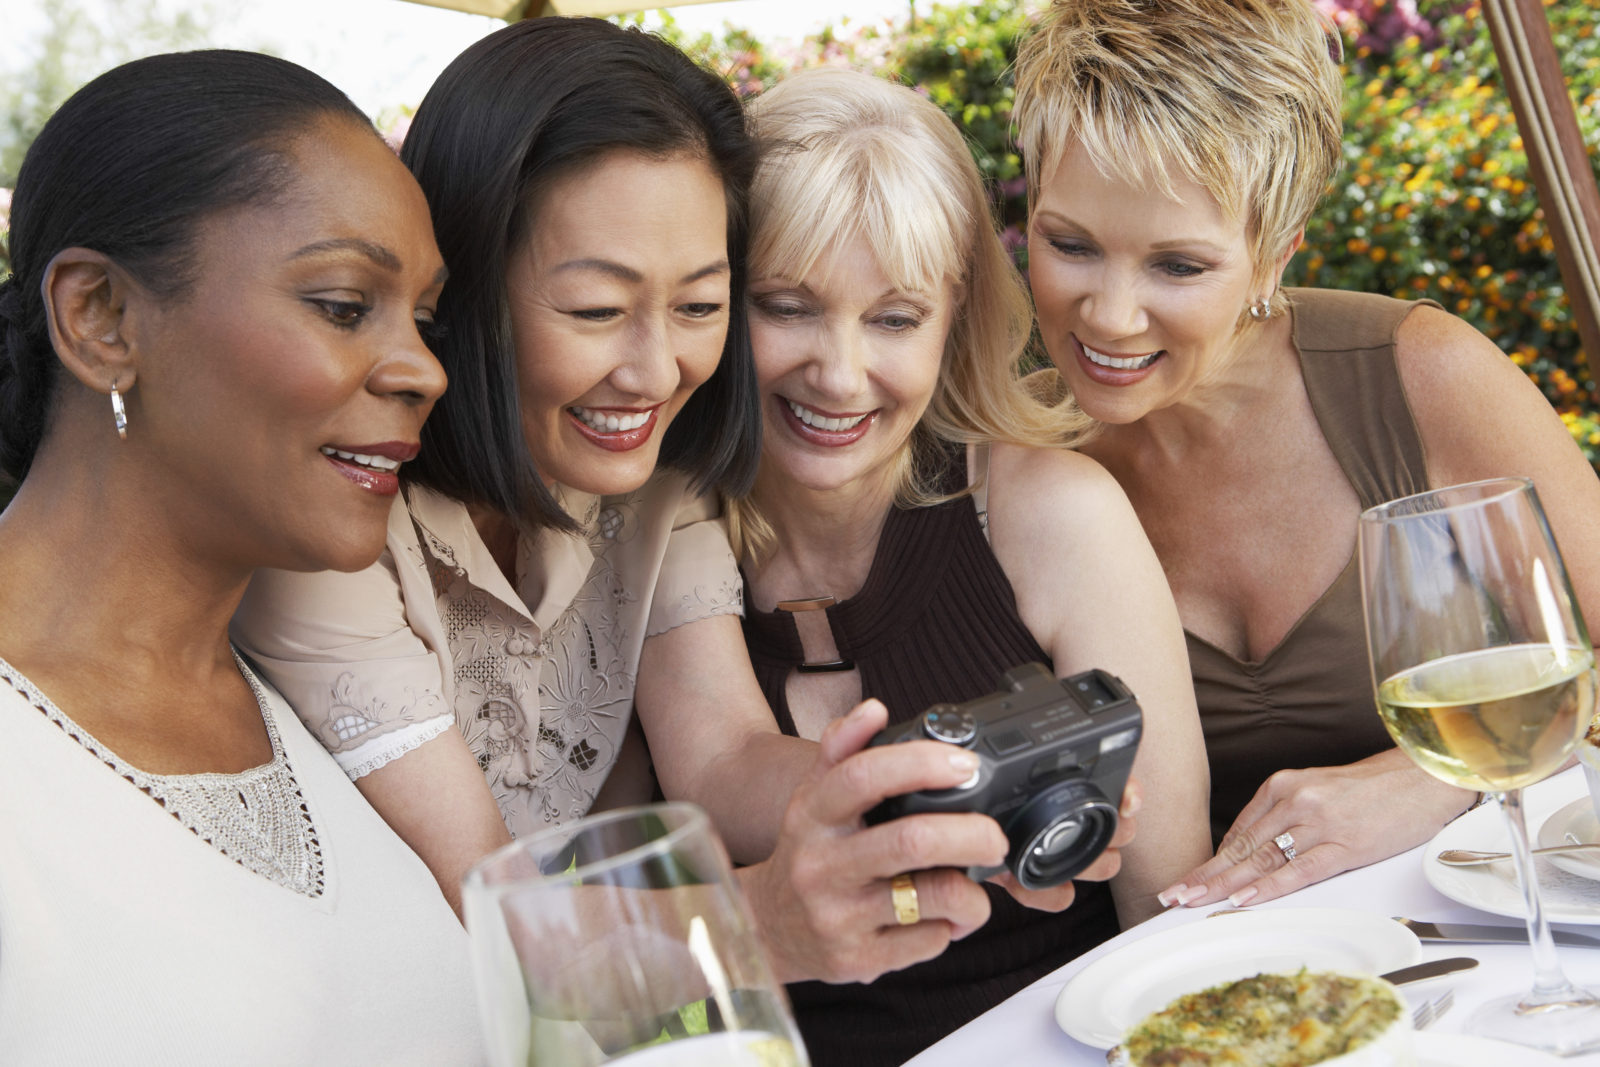 Women enjoying time together